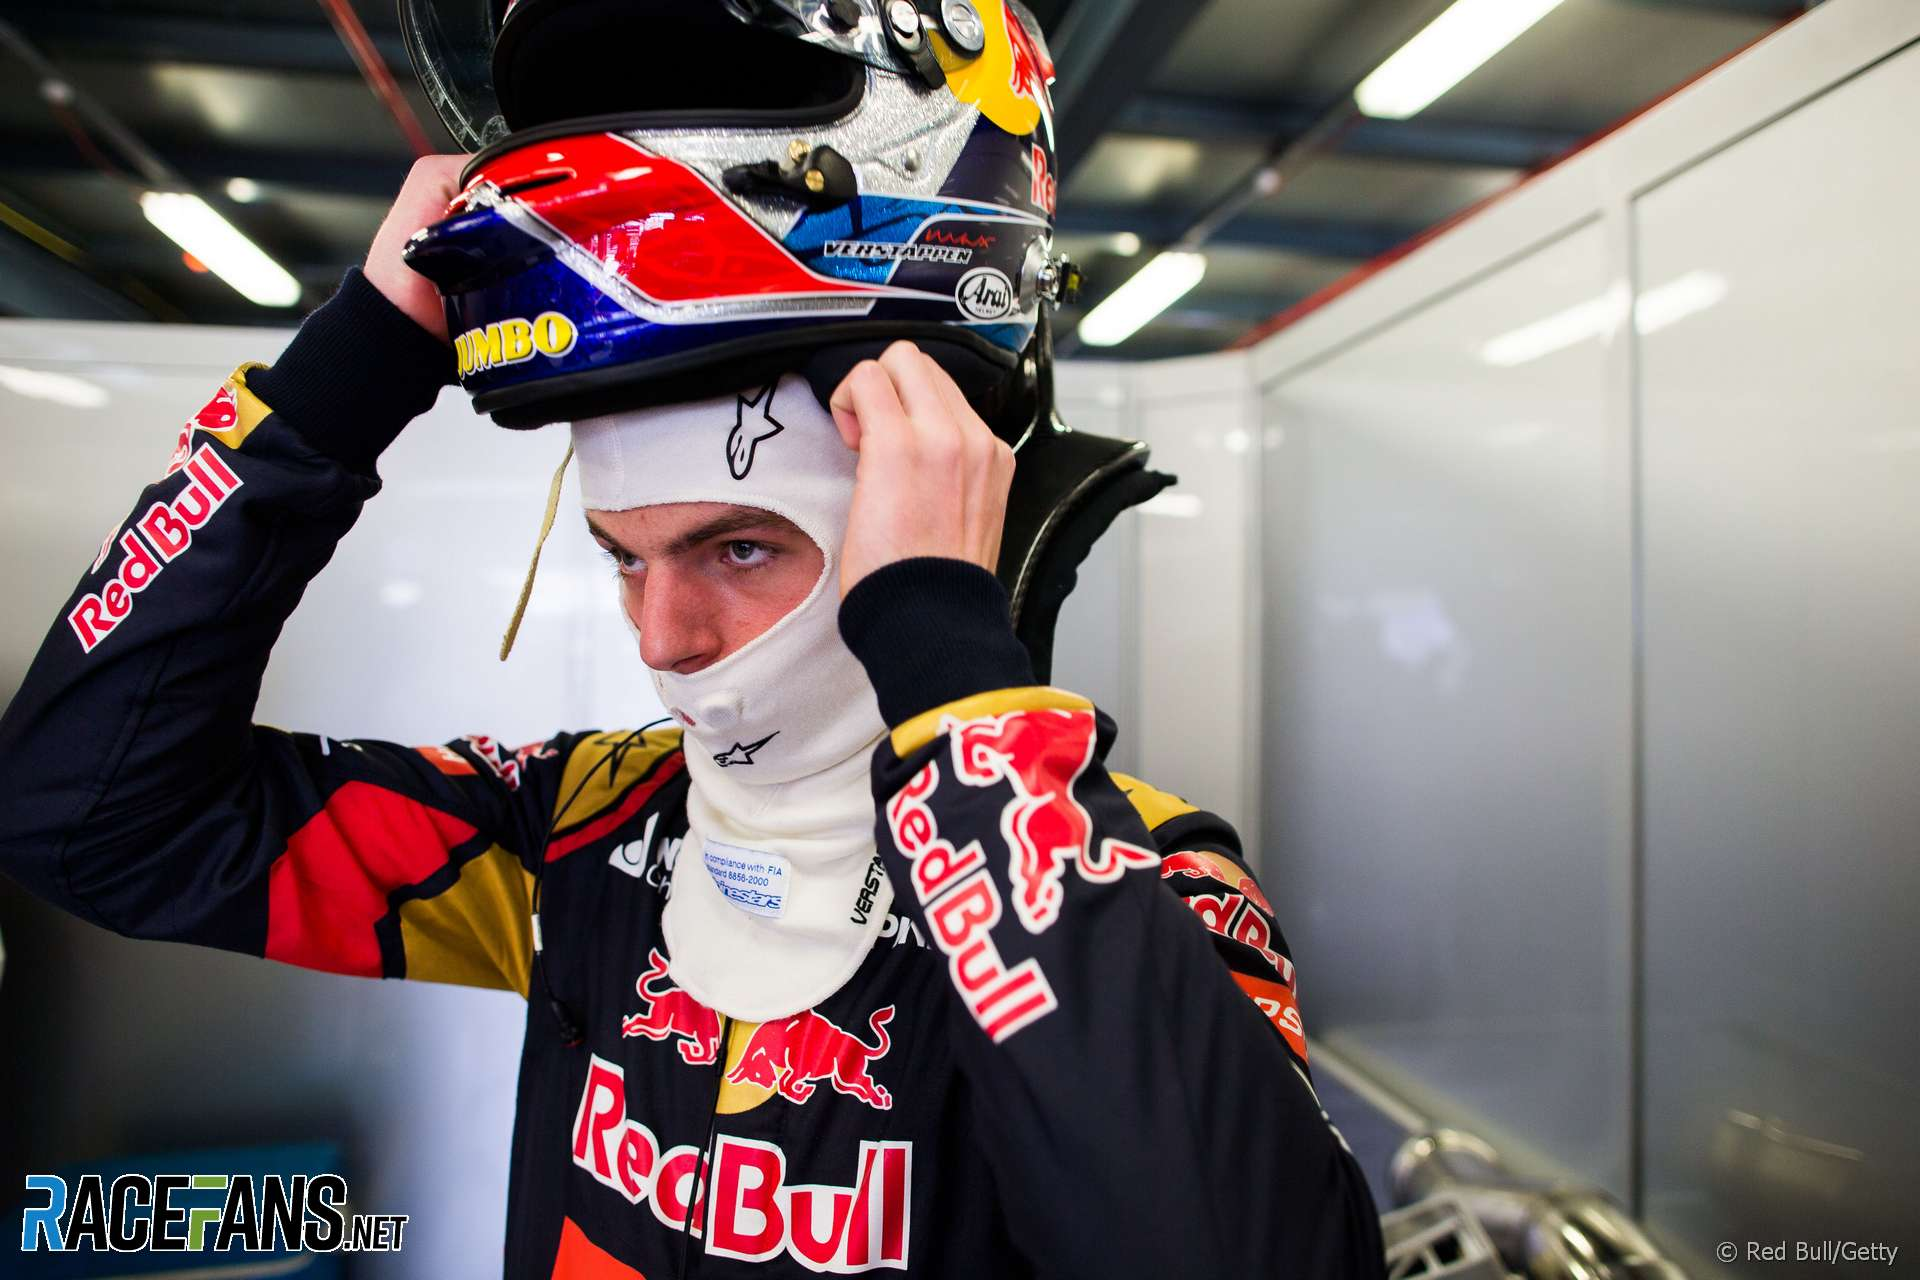 Max Verstappen, Toro Rosso, Melbourne, 2014